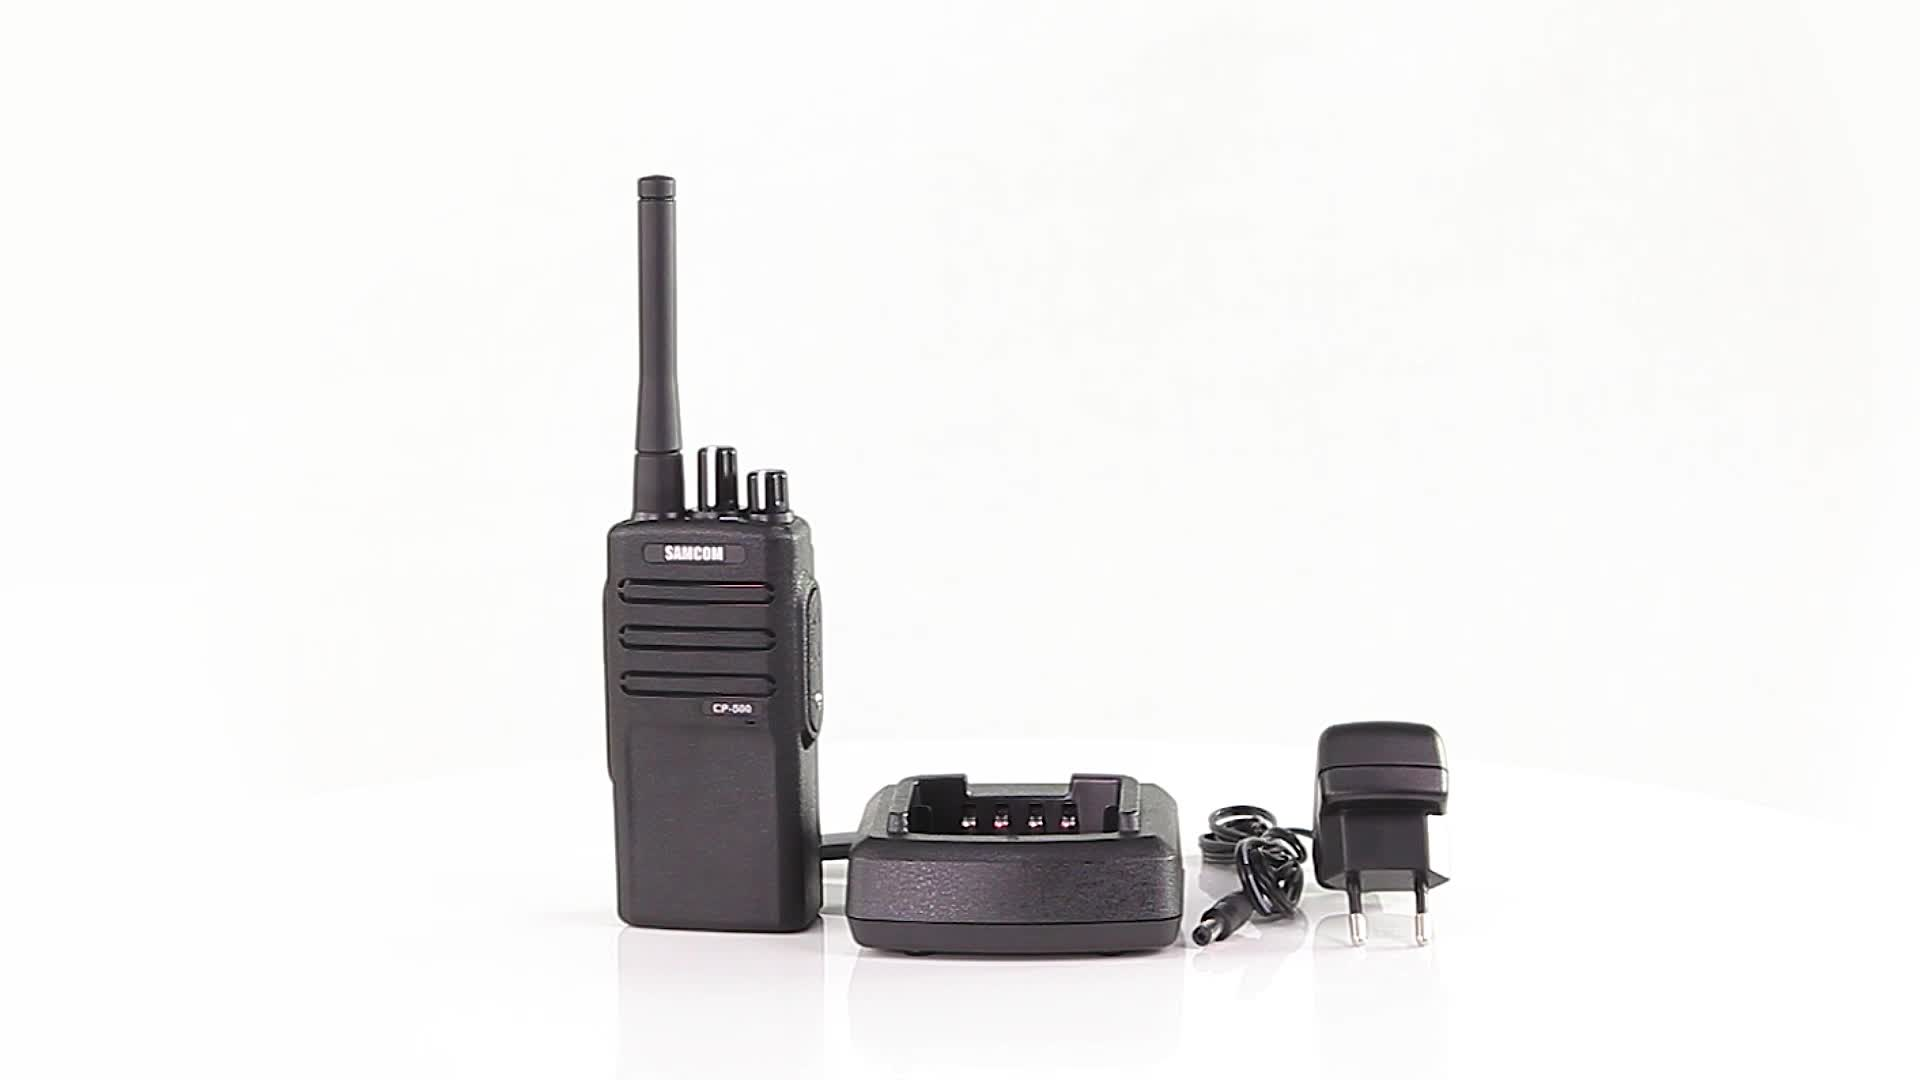 Talki walki 100 km SAMCOM RÁDIOS transceptores hf CP-500 Profissional china